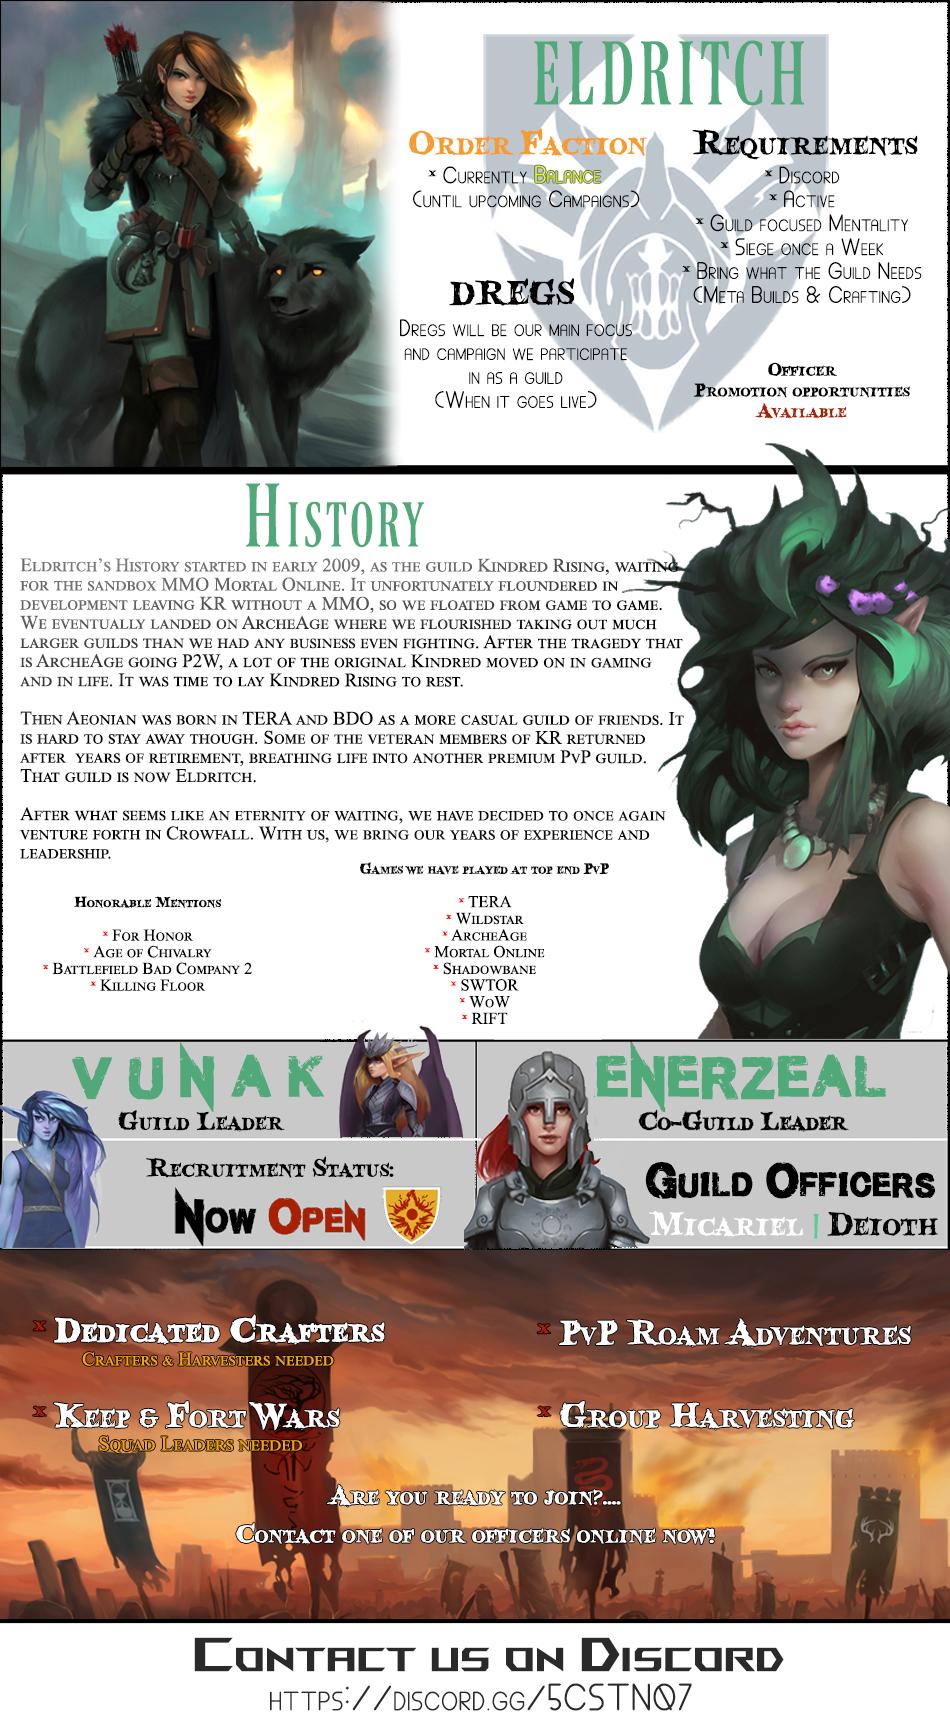 Guild_Information_CF_wip.png